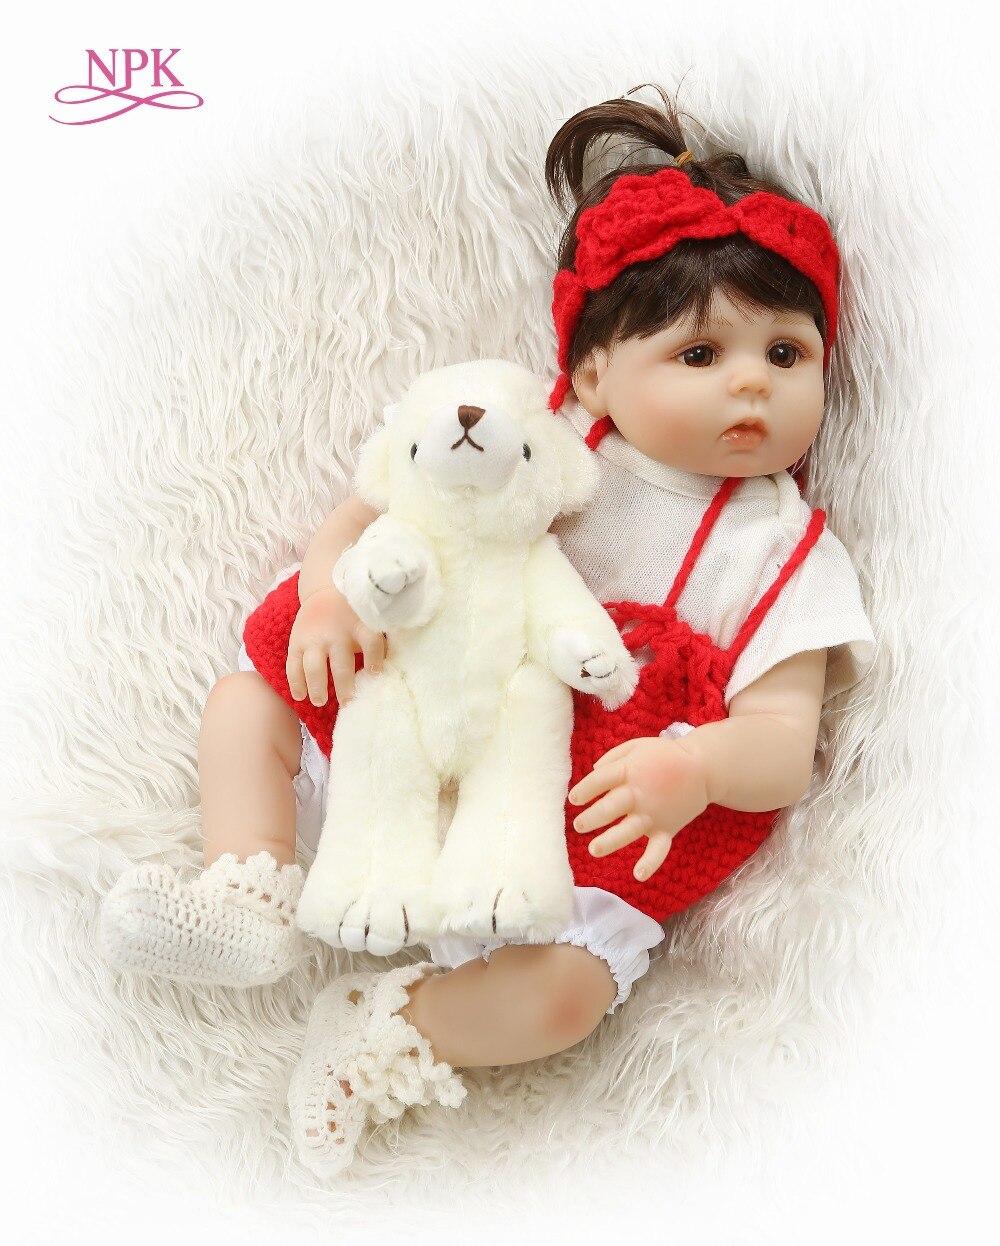 NPK Bebes Reborn Dolls 48CM Reborn Baby Doll Full Vinyl Silicone Newborn Baby Doll bonecas Whole